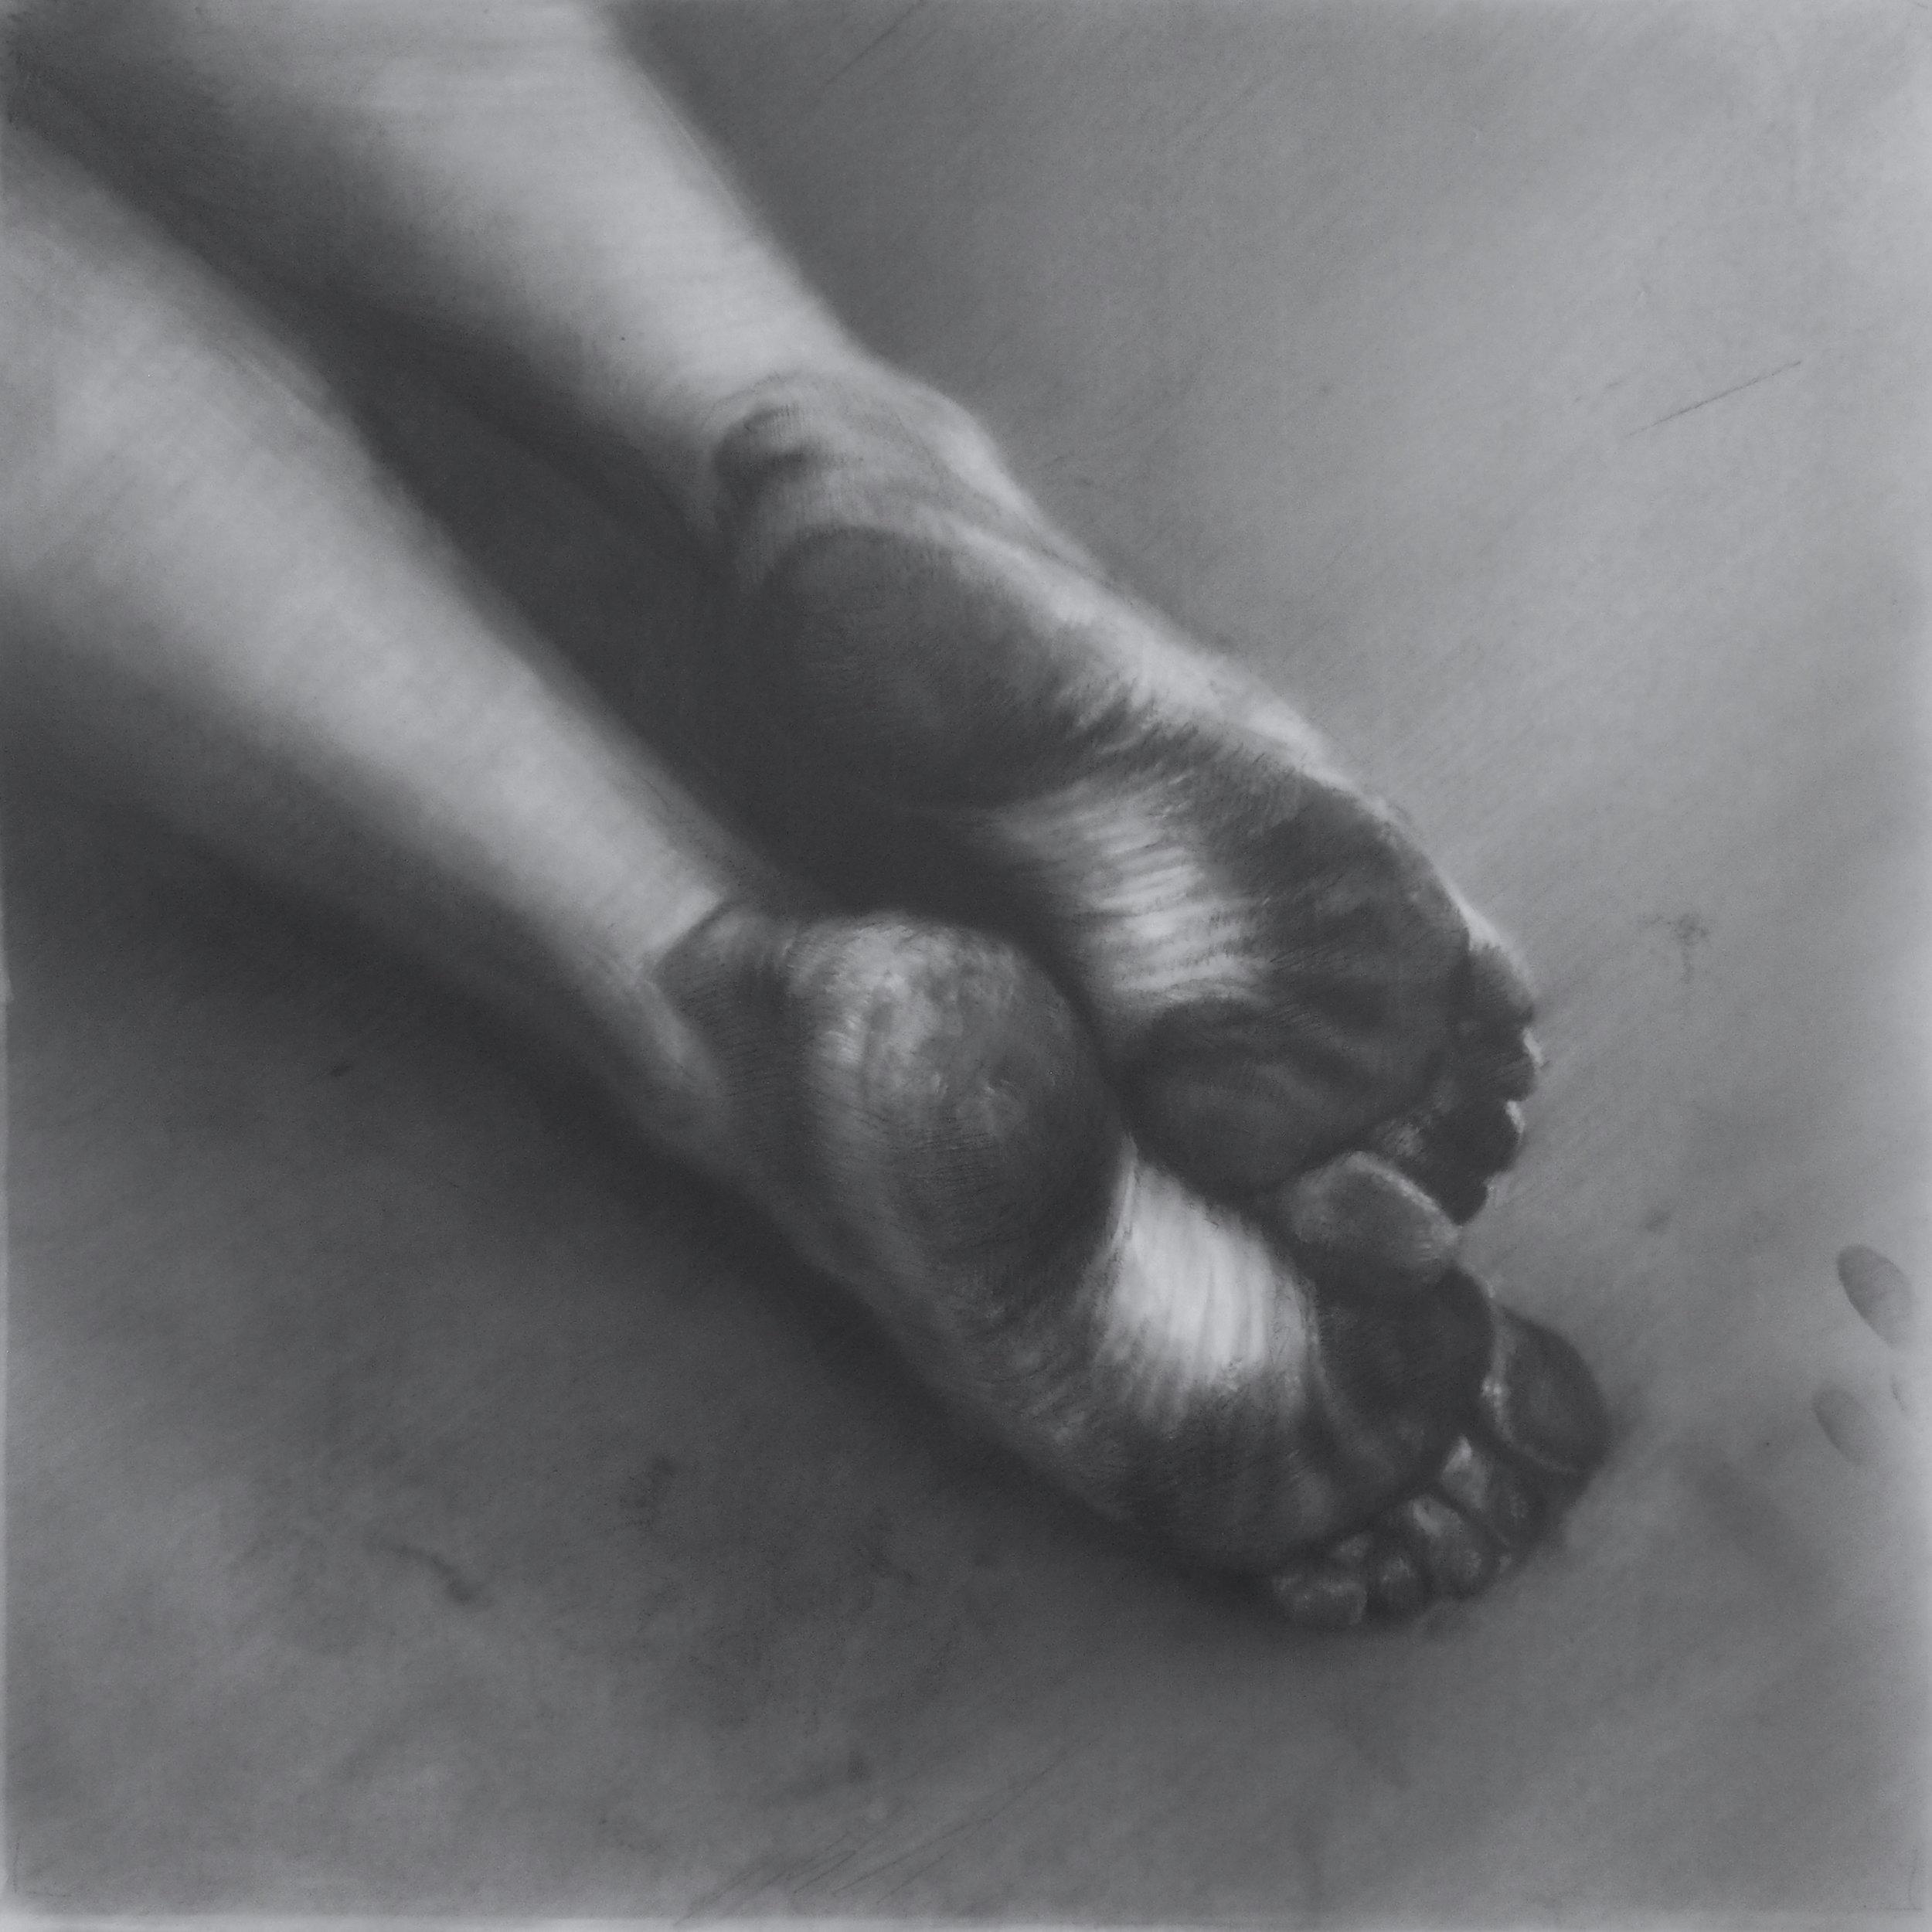 Maria kreyn - feet - graphite on mylar color  .jpg